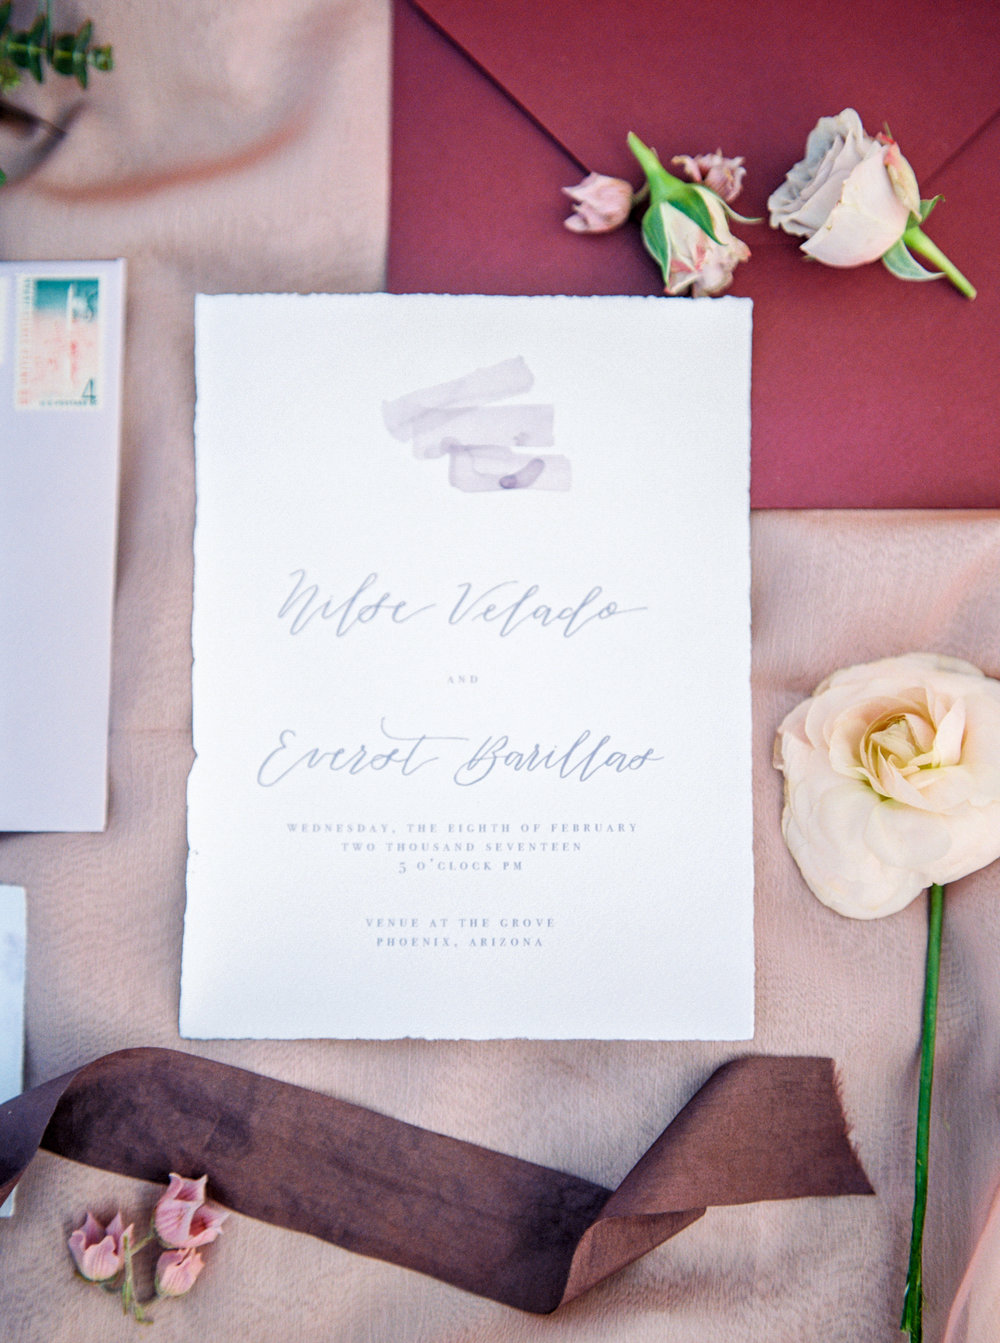 THE WHITE WREN - ELEGANT GARDEN WEDDING2017